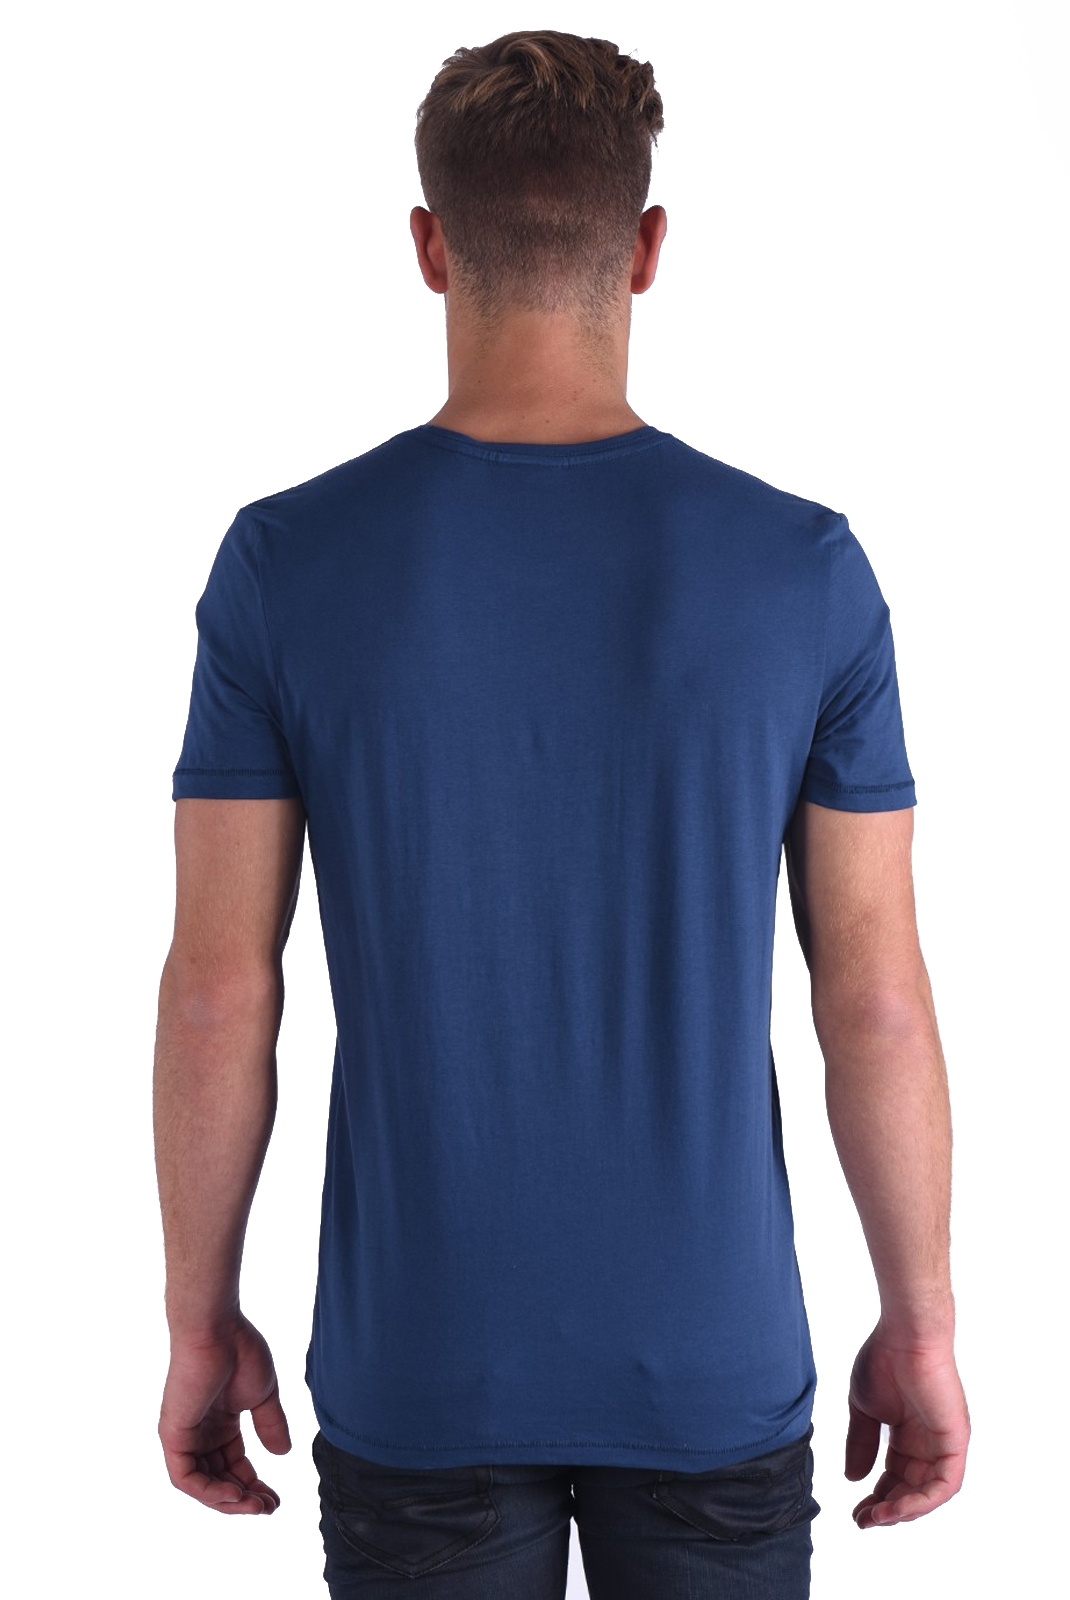 Tee-shirts  Kaporal BRISK BLUE US